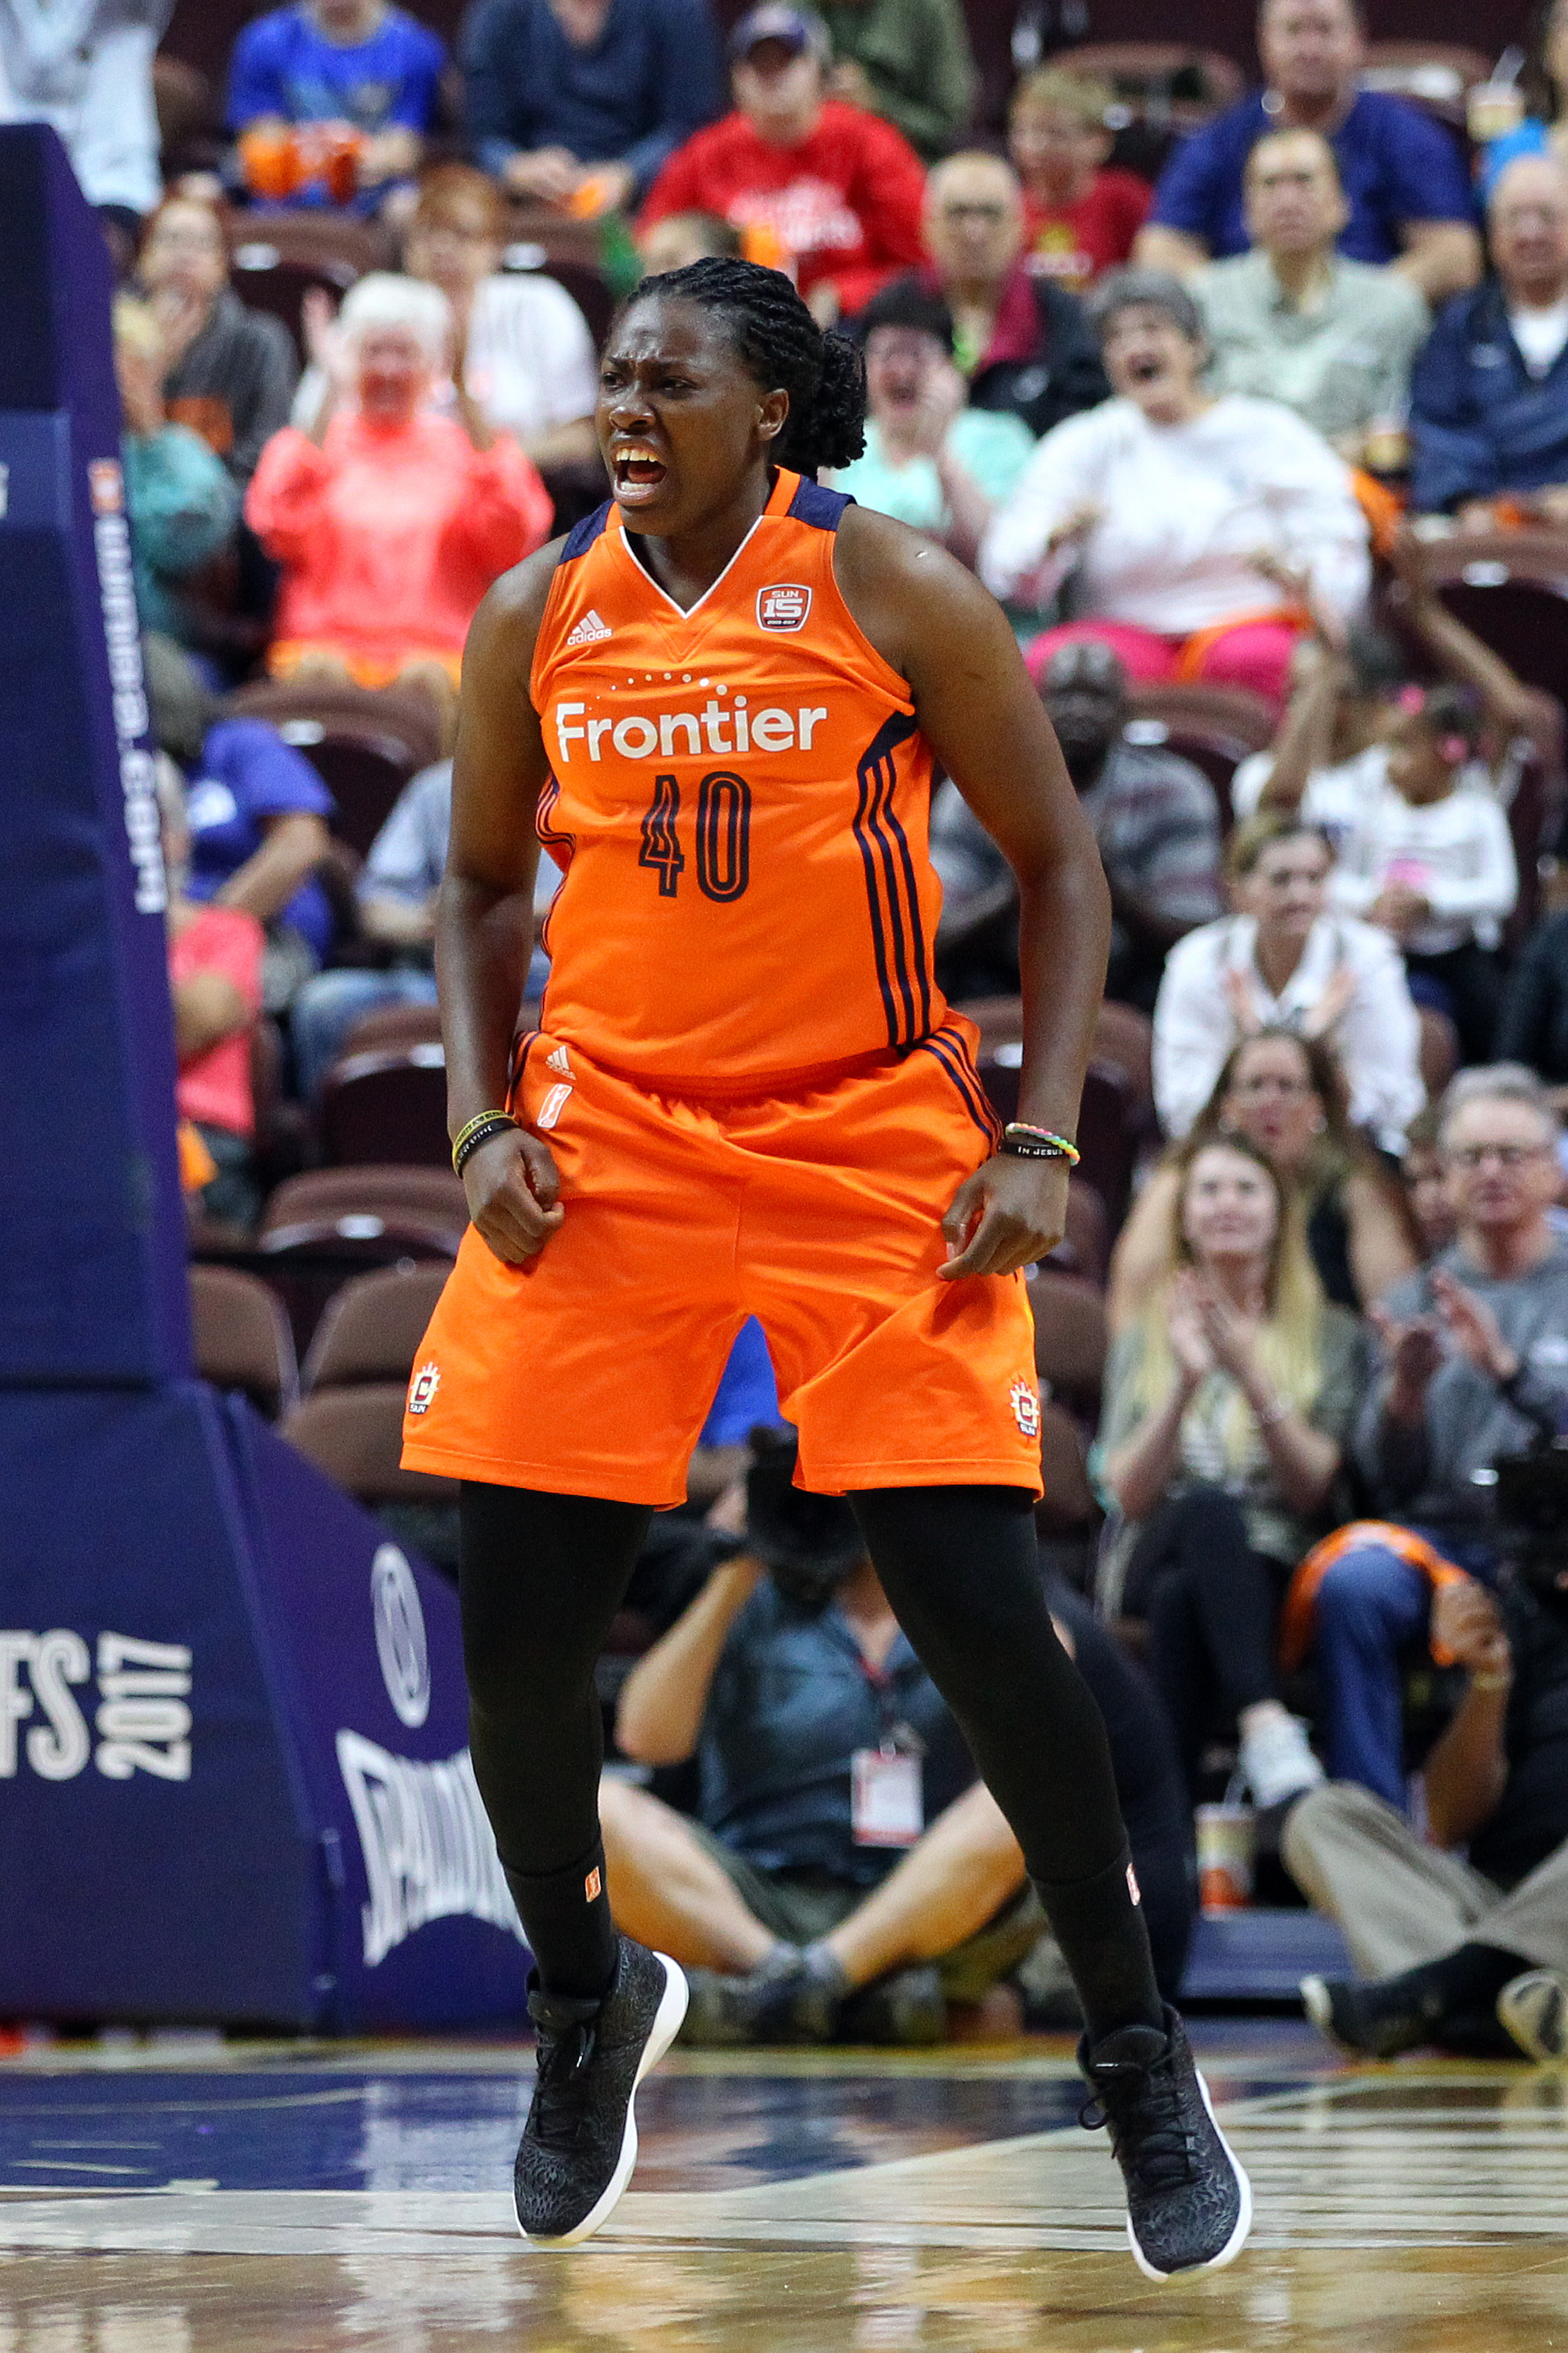 WNBA: SEP 10 Second Round - Phoenix Mercury at Connecticut Sun